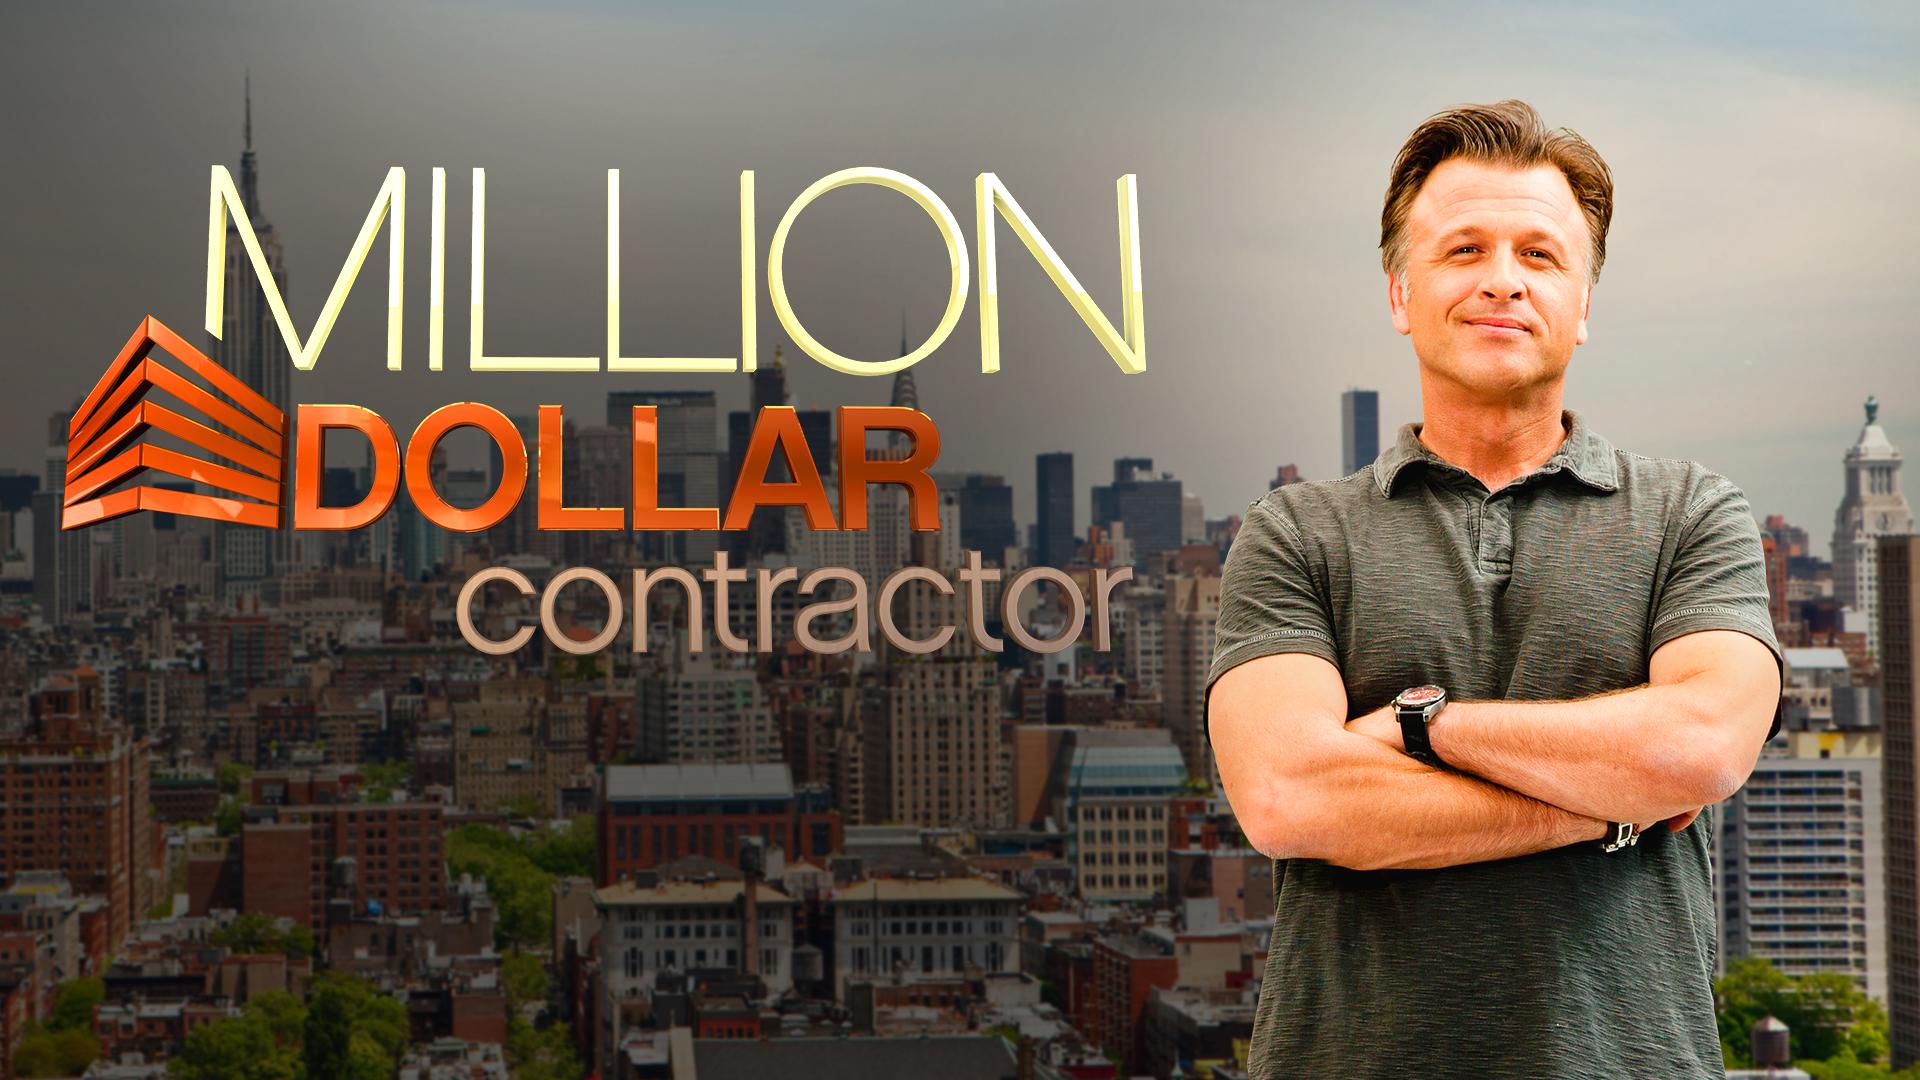 Photo via Million Dollar Contractor Show